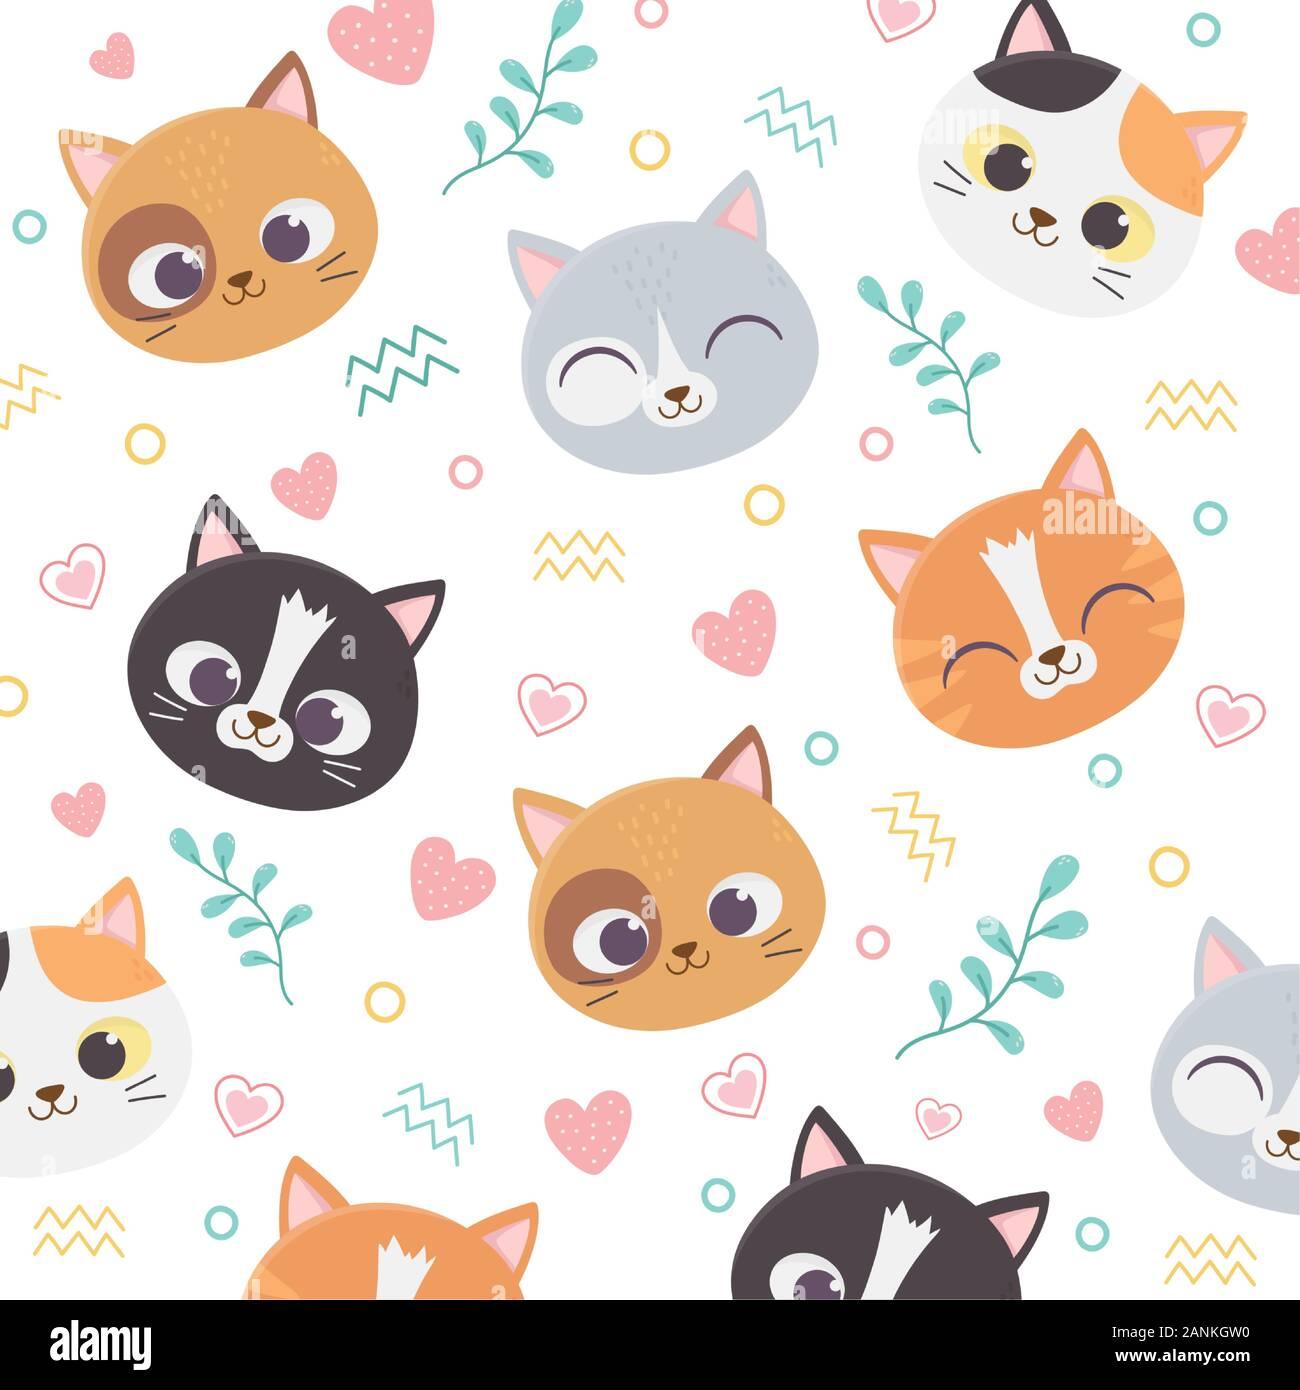 Cute Pet Cats Face Hearts Love Foliage Cartoon Background Vector Illustration Stock Vector Image Art Alamy